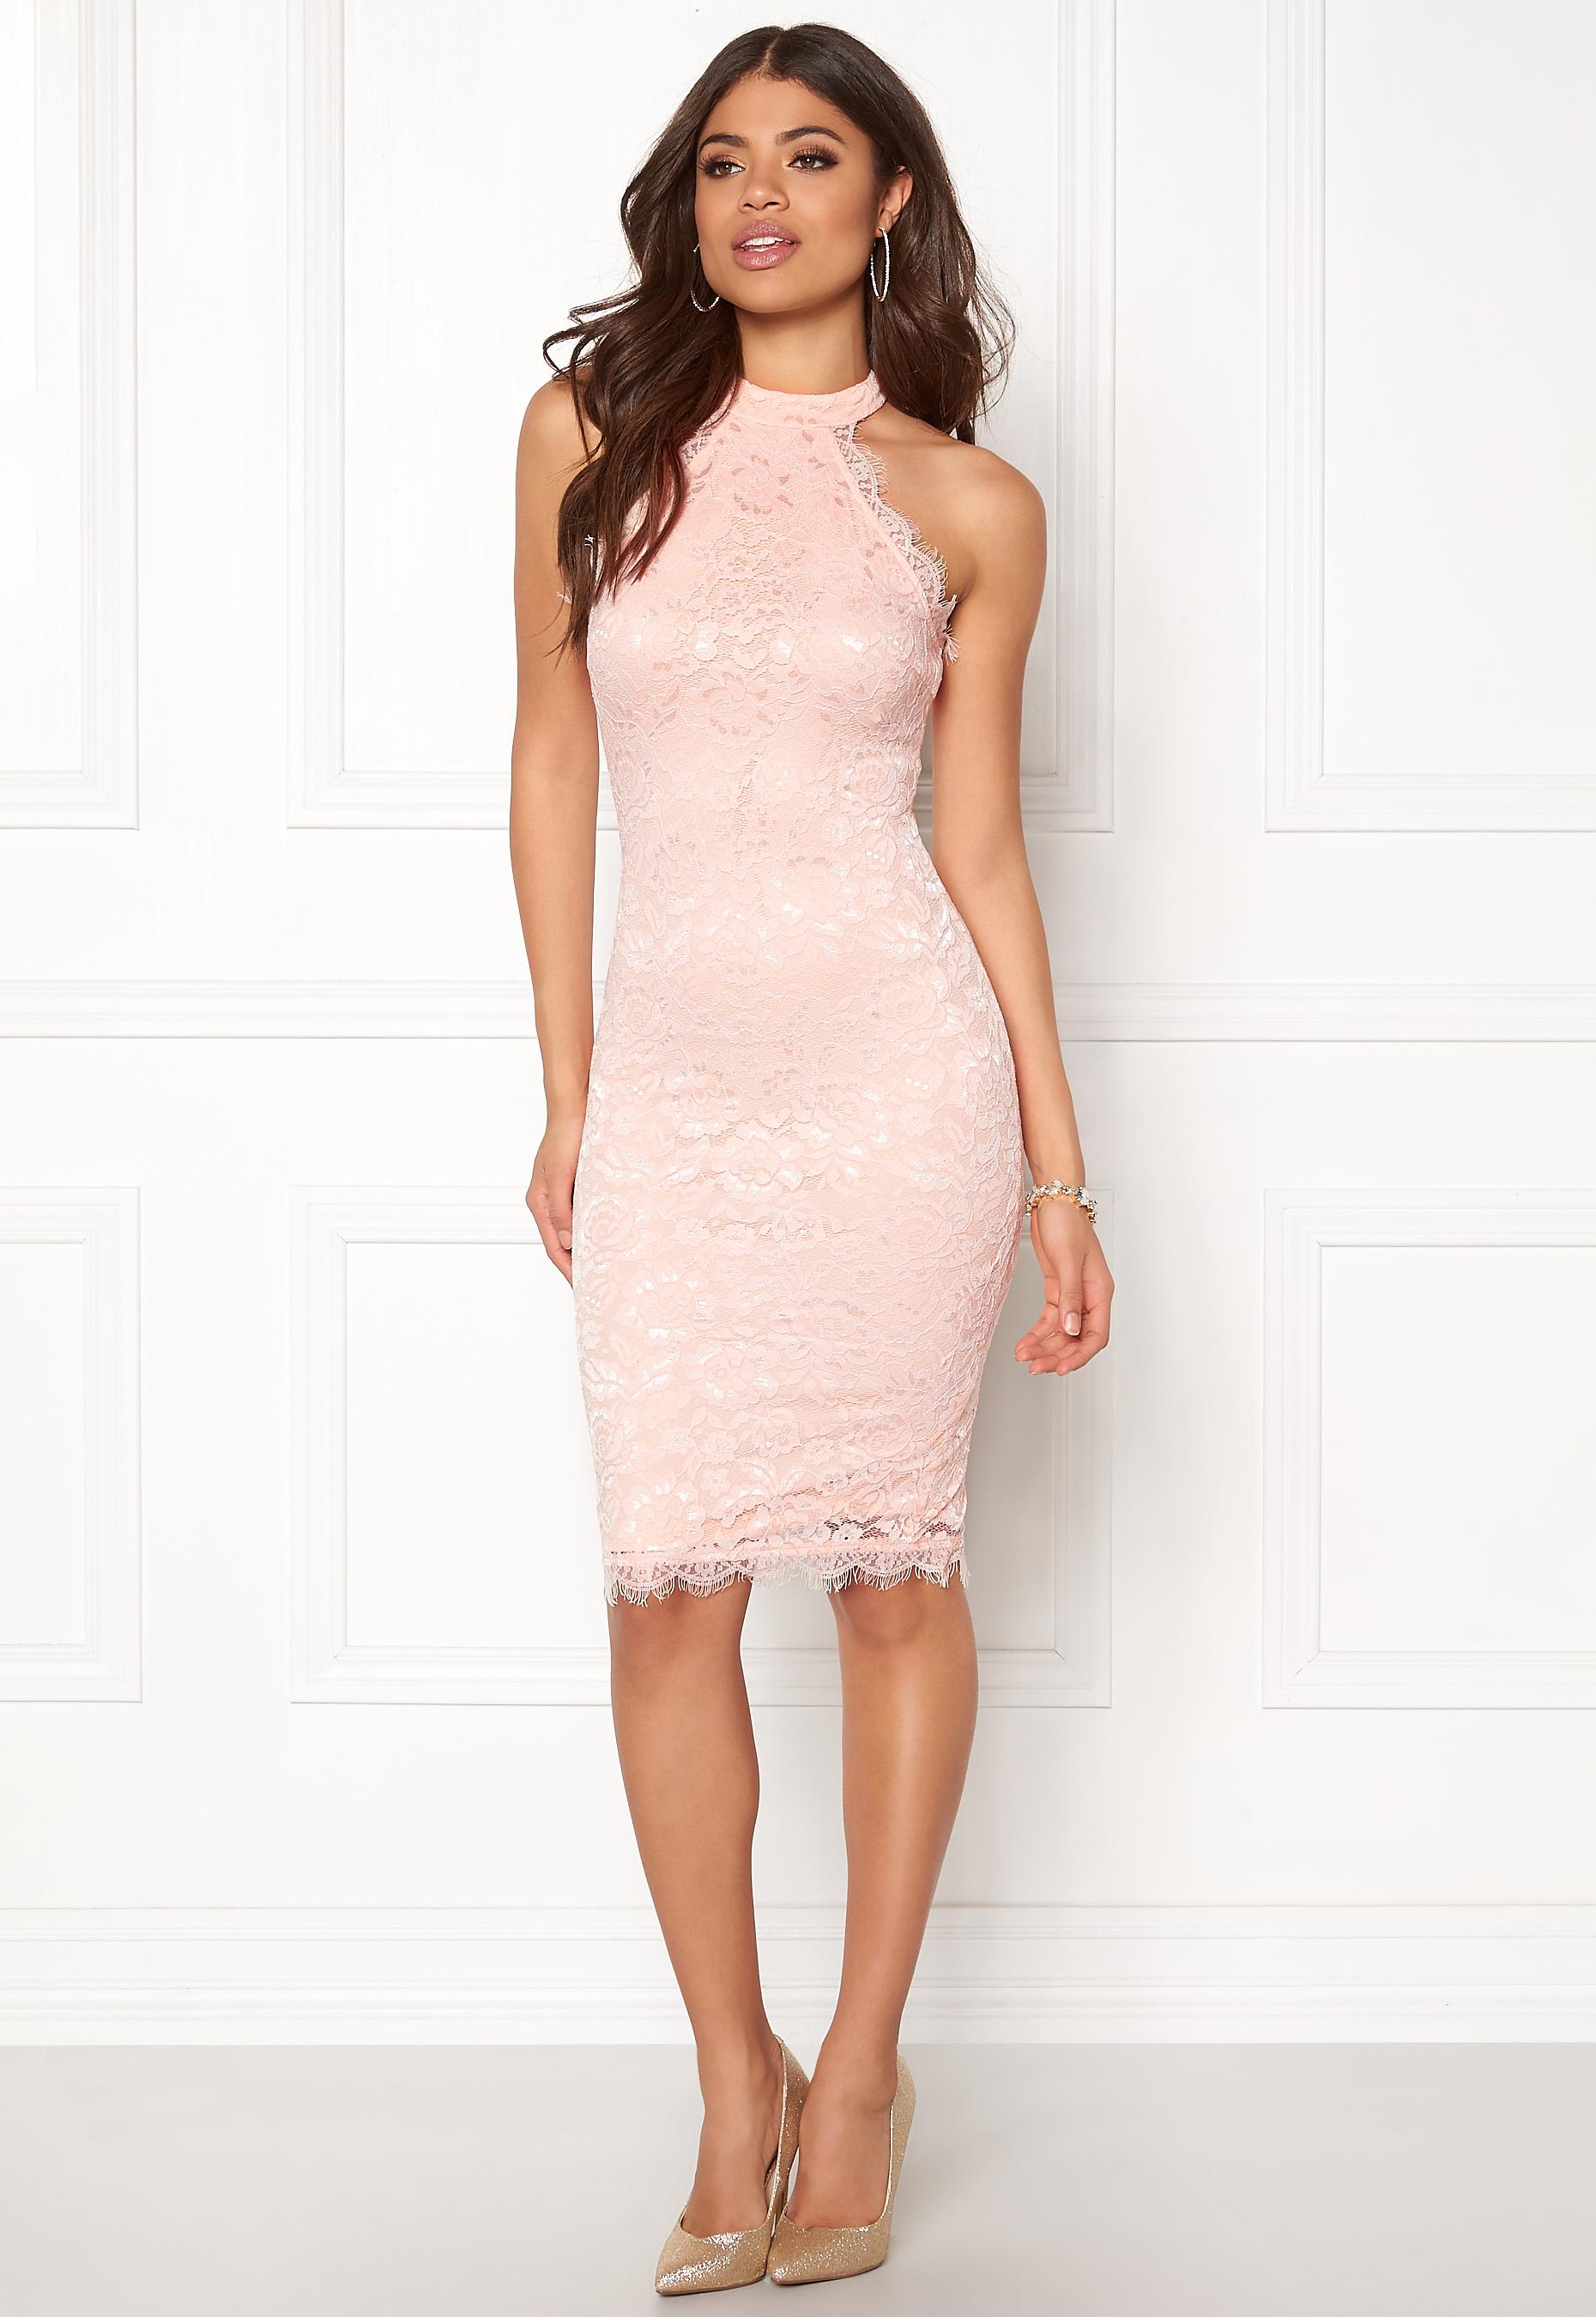 AX Paris High Neck Lace Midi Dress Nude - Bubbleroom 0ec868162